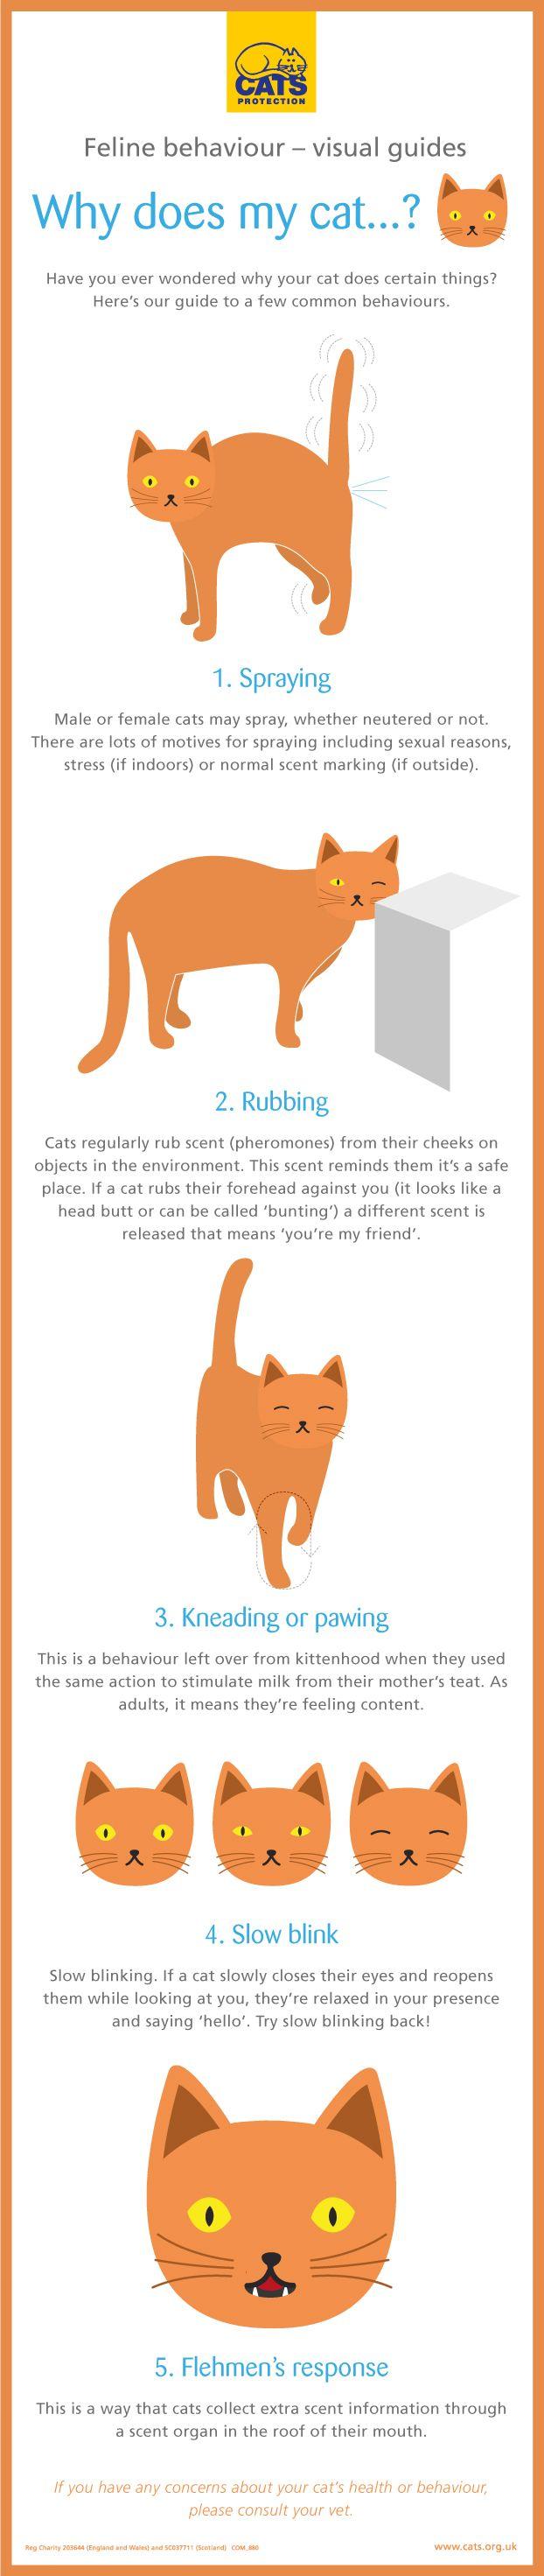 Feline behaviour explained – why does my cat…?